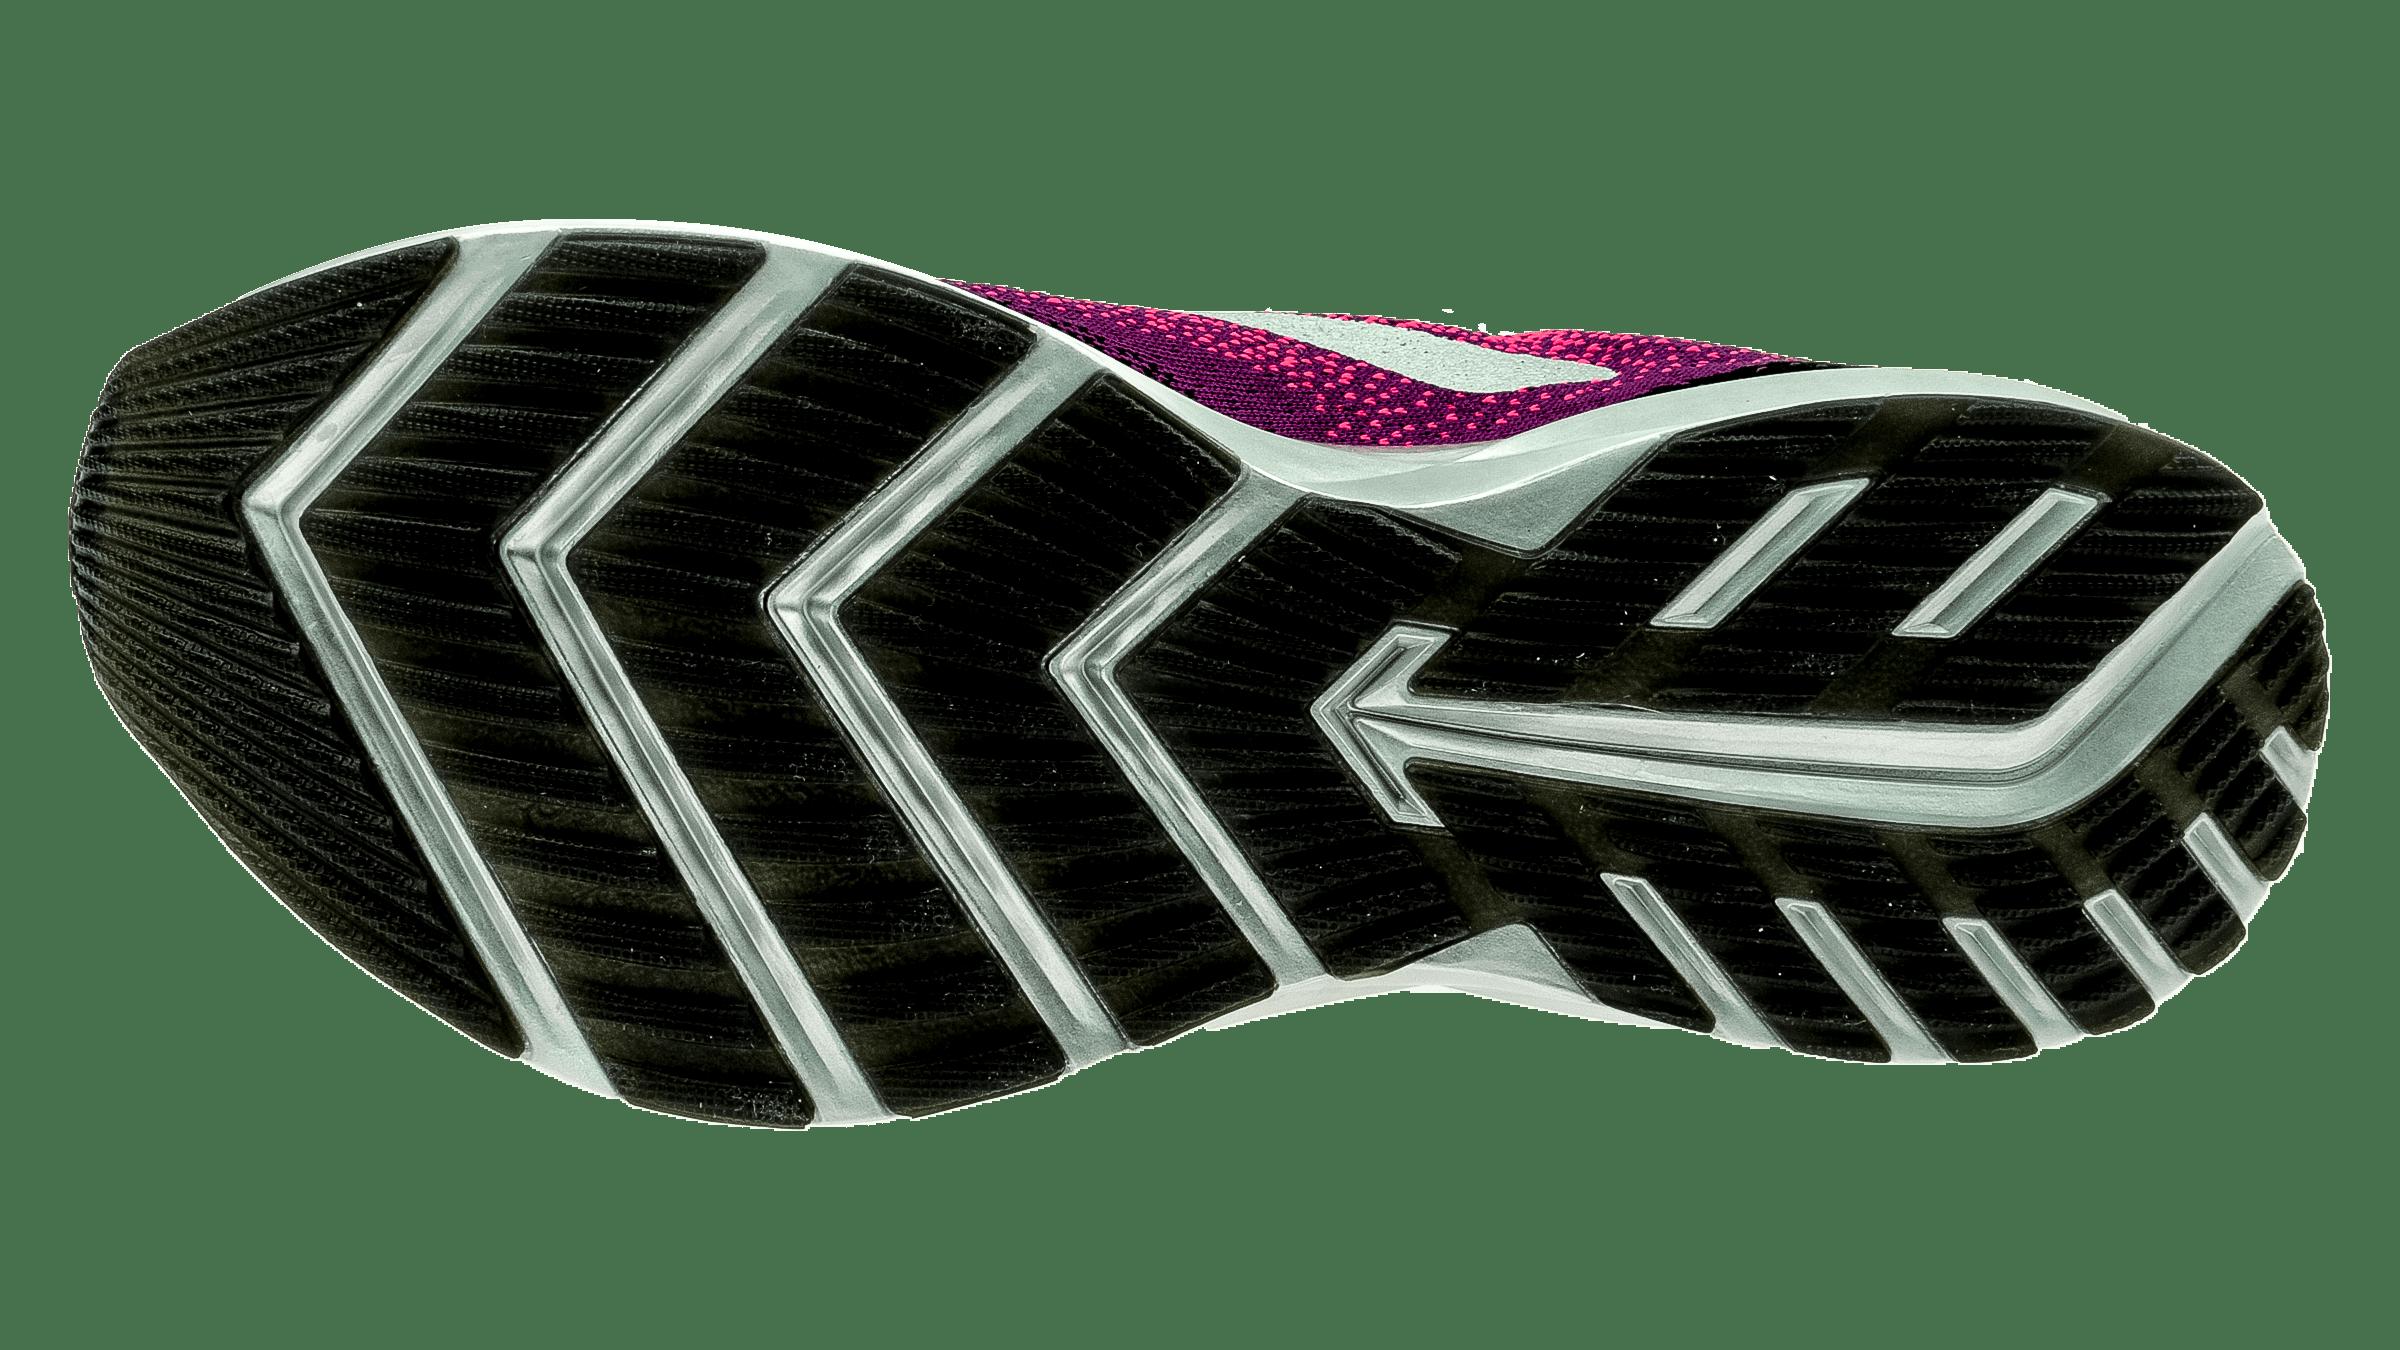 4a4123eb86381 Brooks Levitate 2 pink black aqua bestellen bij Skate-dump.de